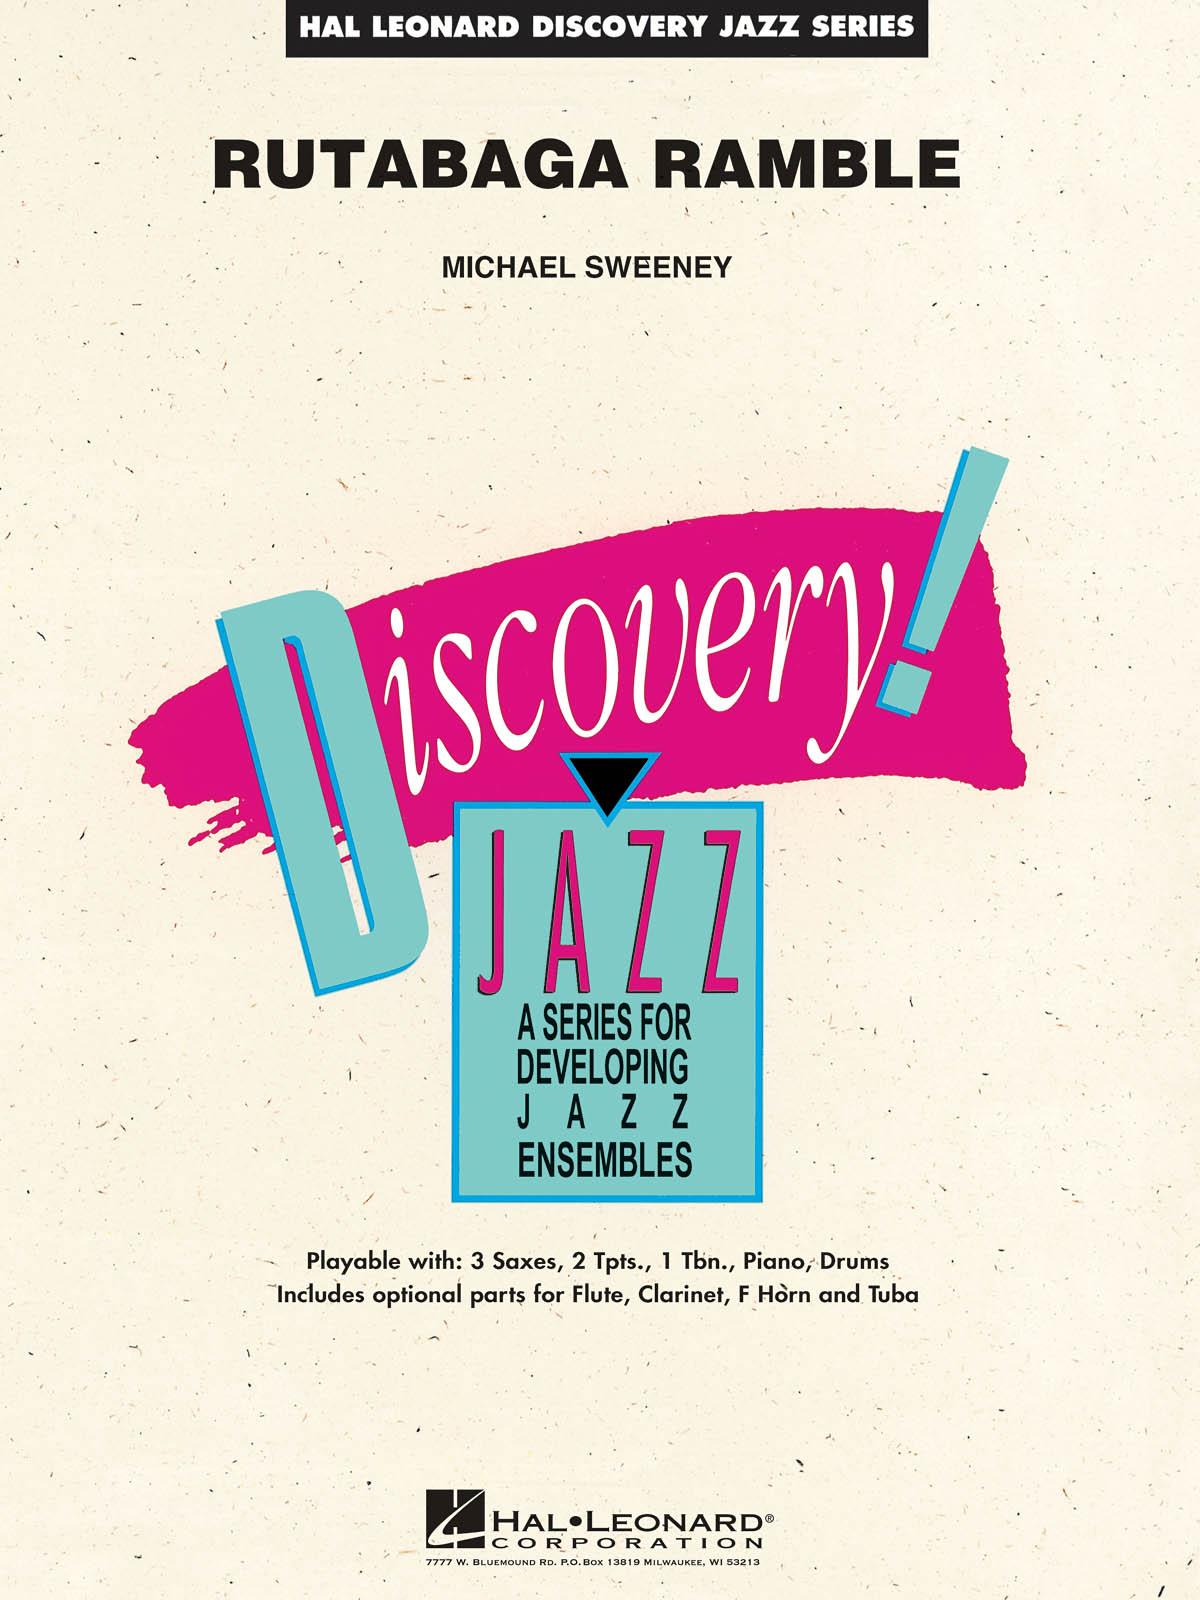 Rutabaga Ramble: Discovery Jazz